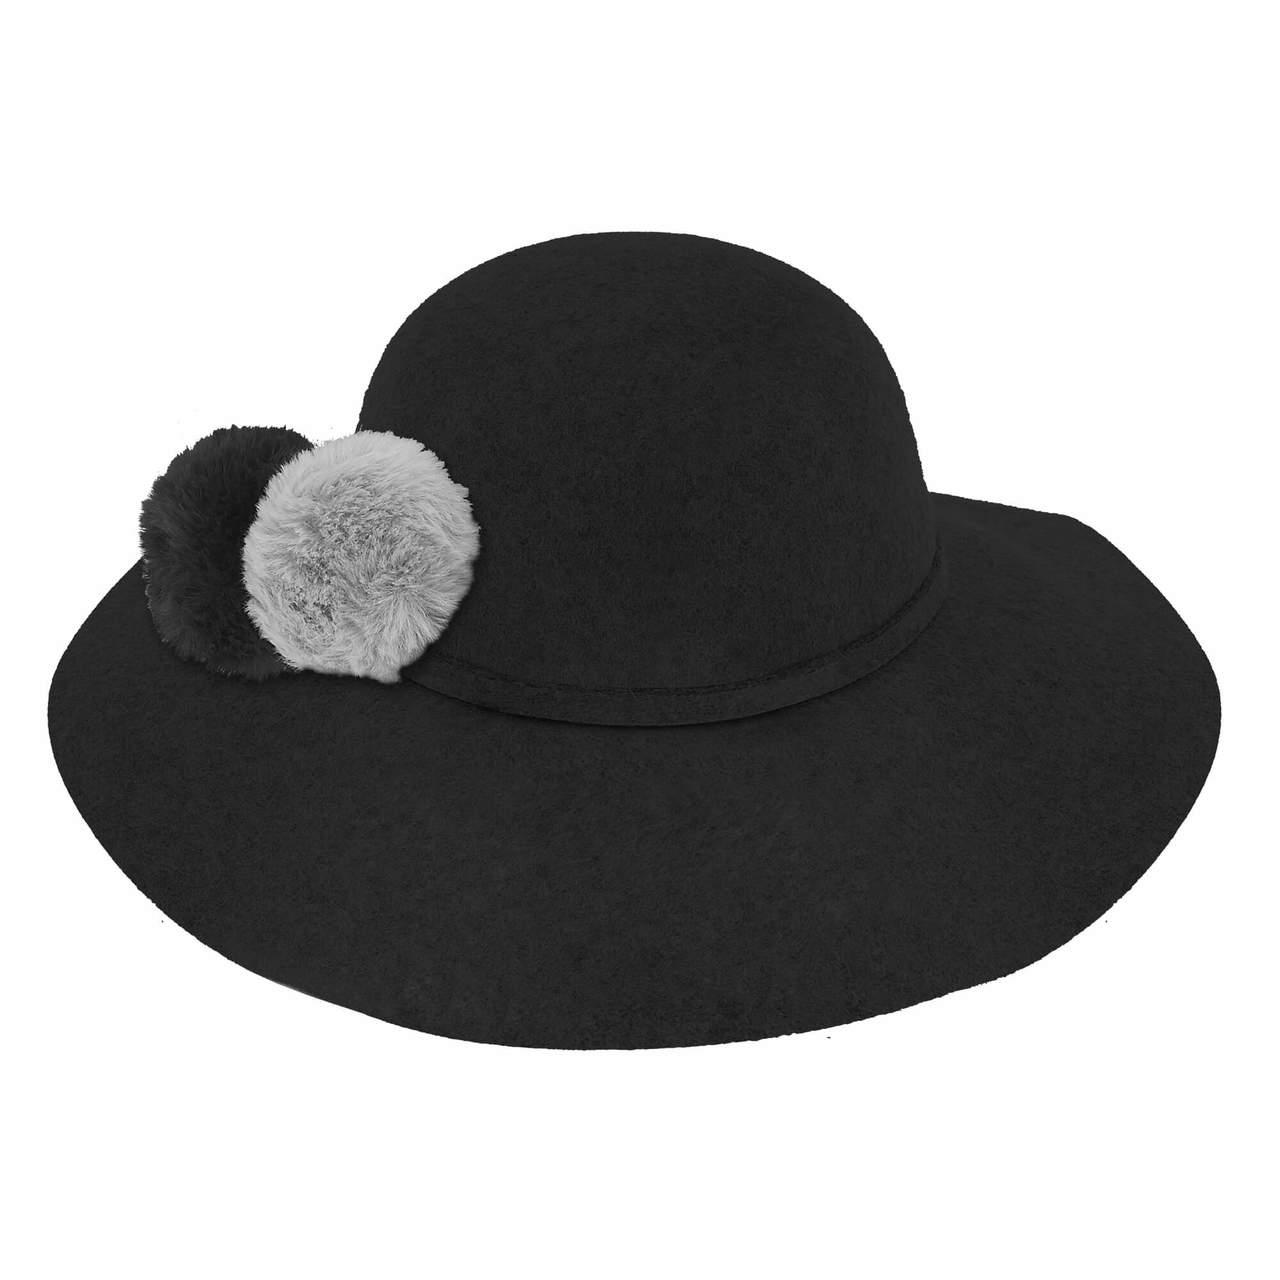 807b1bb21e6e85 ... Wool Felt Floppy with two Tone Faux Fur Pom Pom | Black